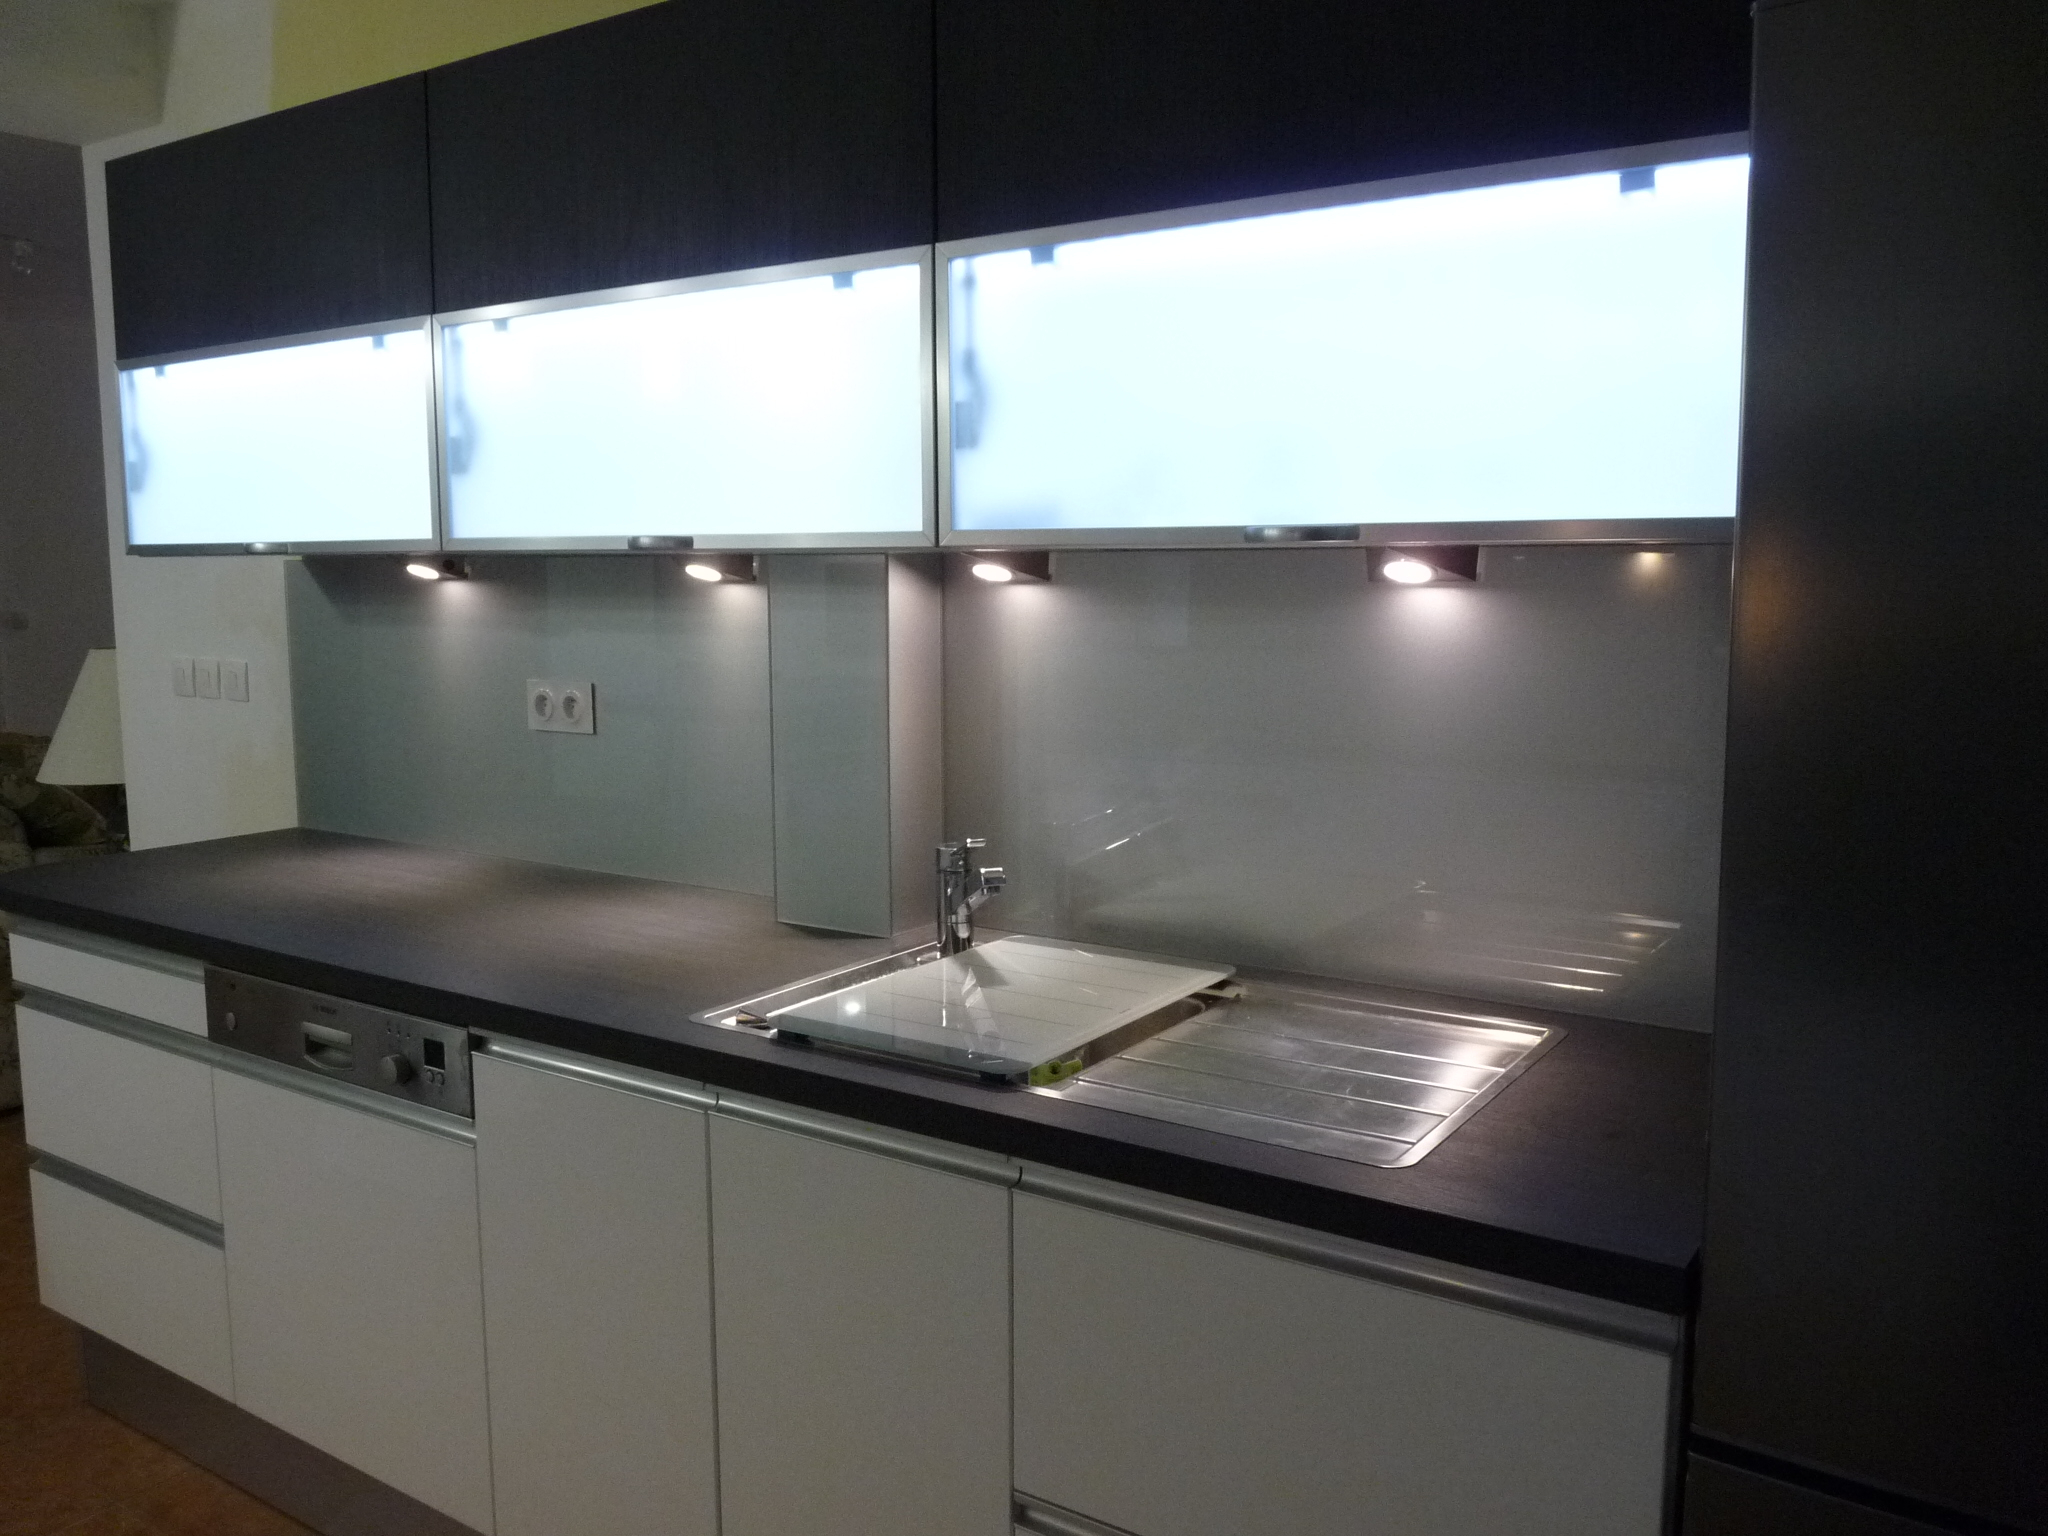 credence cuisine verre castorama. Black Bedroom Furniture Sets. Home Design Ideas